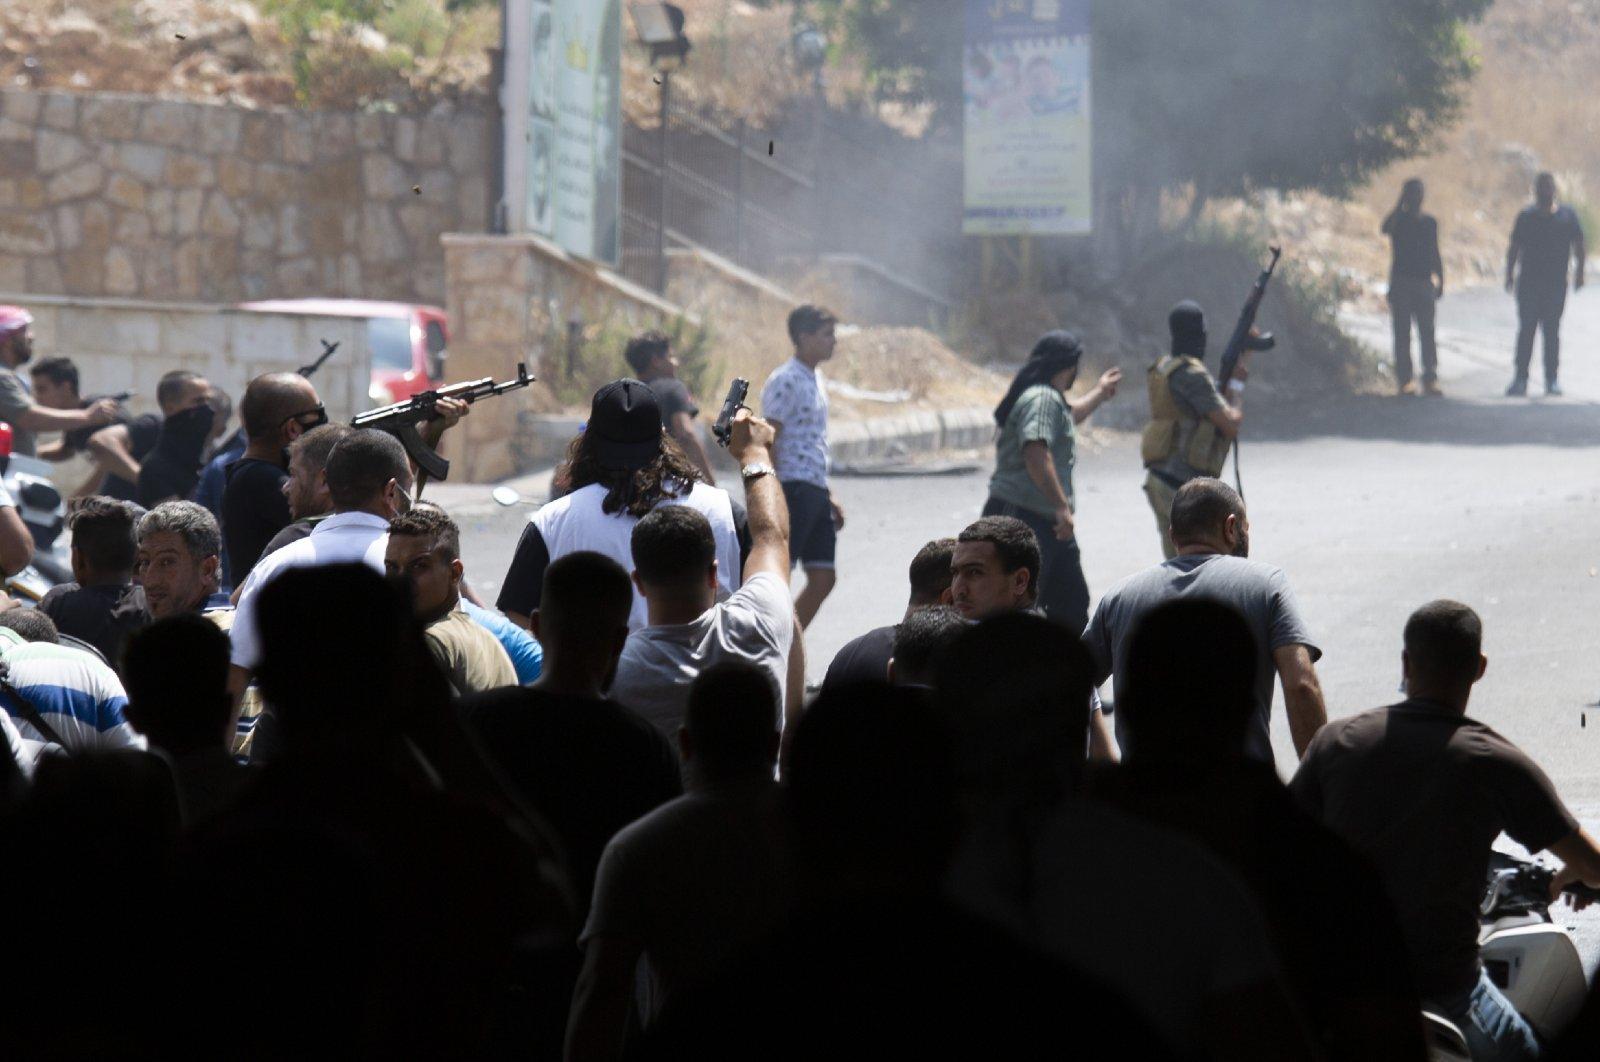 Gunmen open fire on a building in Khaldeh, south of Beirut, Lebanon, Aug. 28, 2020. (AP Photo)